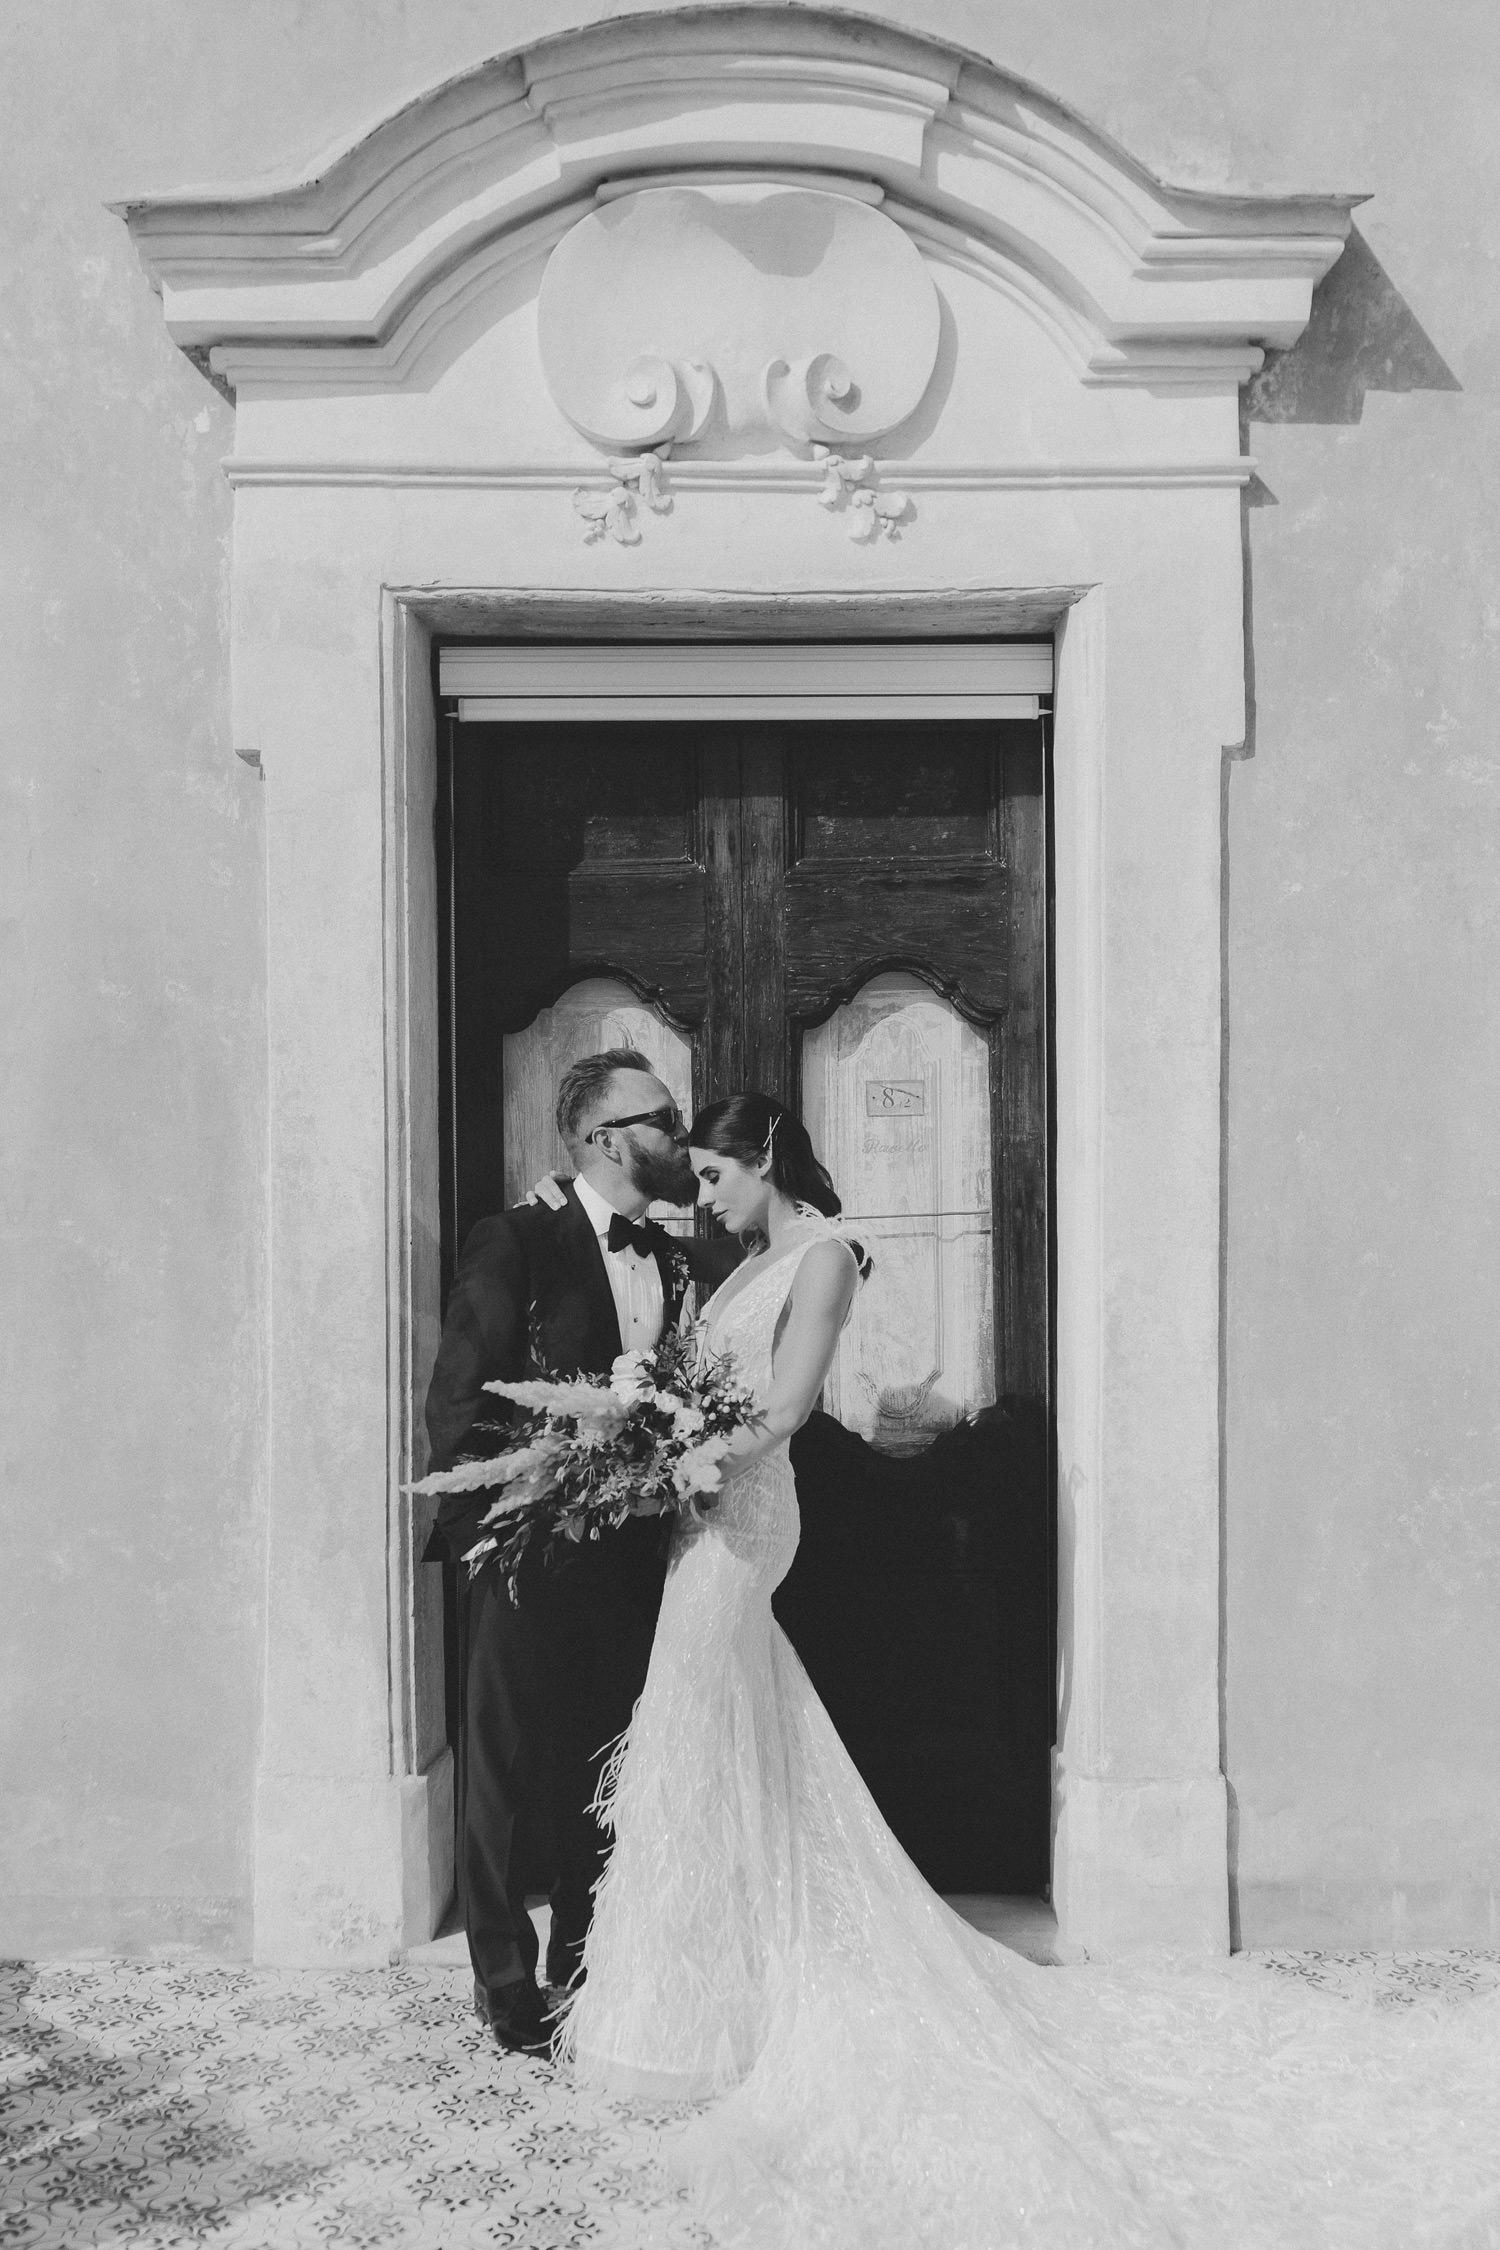 Luxury Villa San Giacomo wedding, Positano | Photo: Camilla Anchisi Photography - Villa San Giacomo wedding photographer